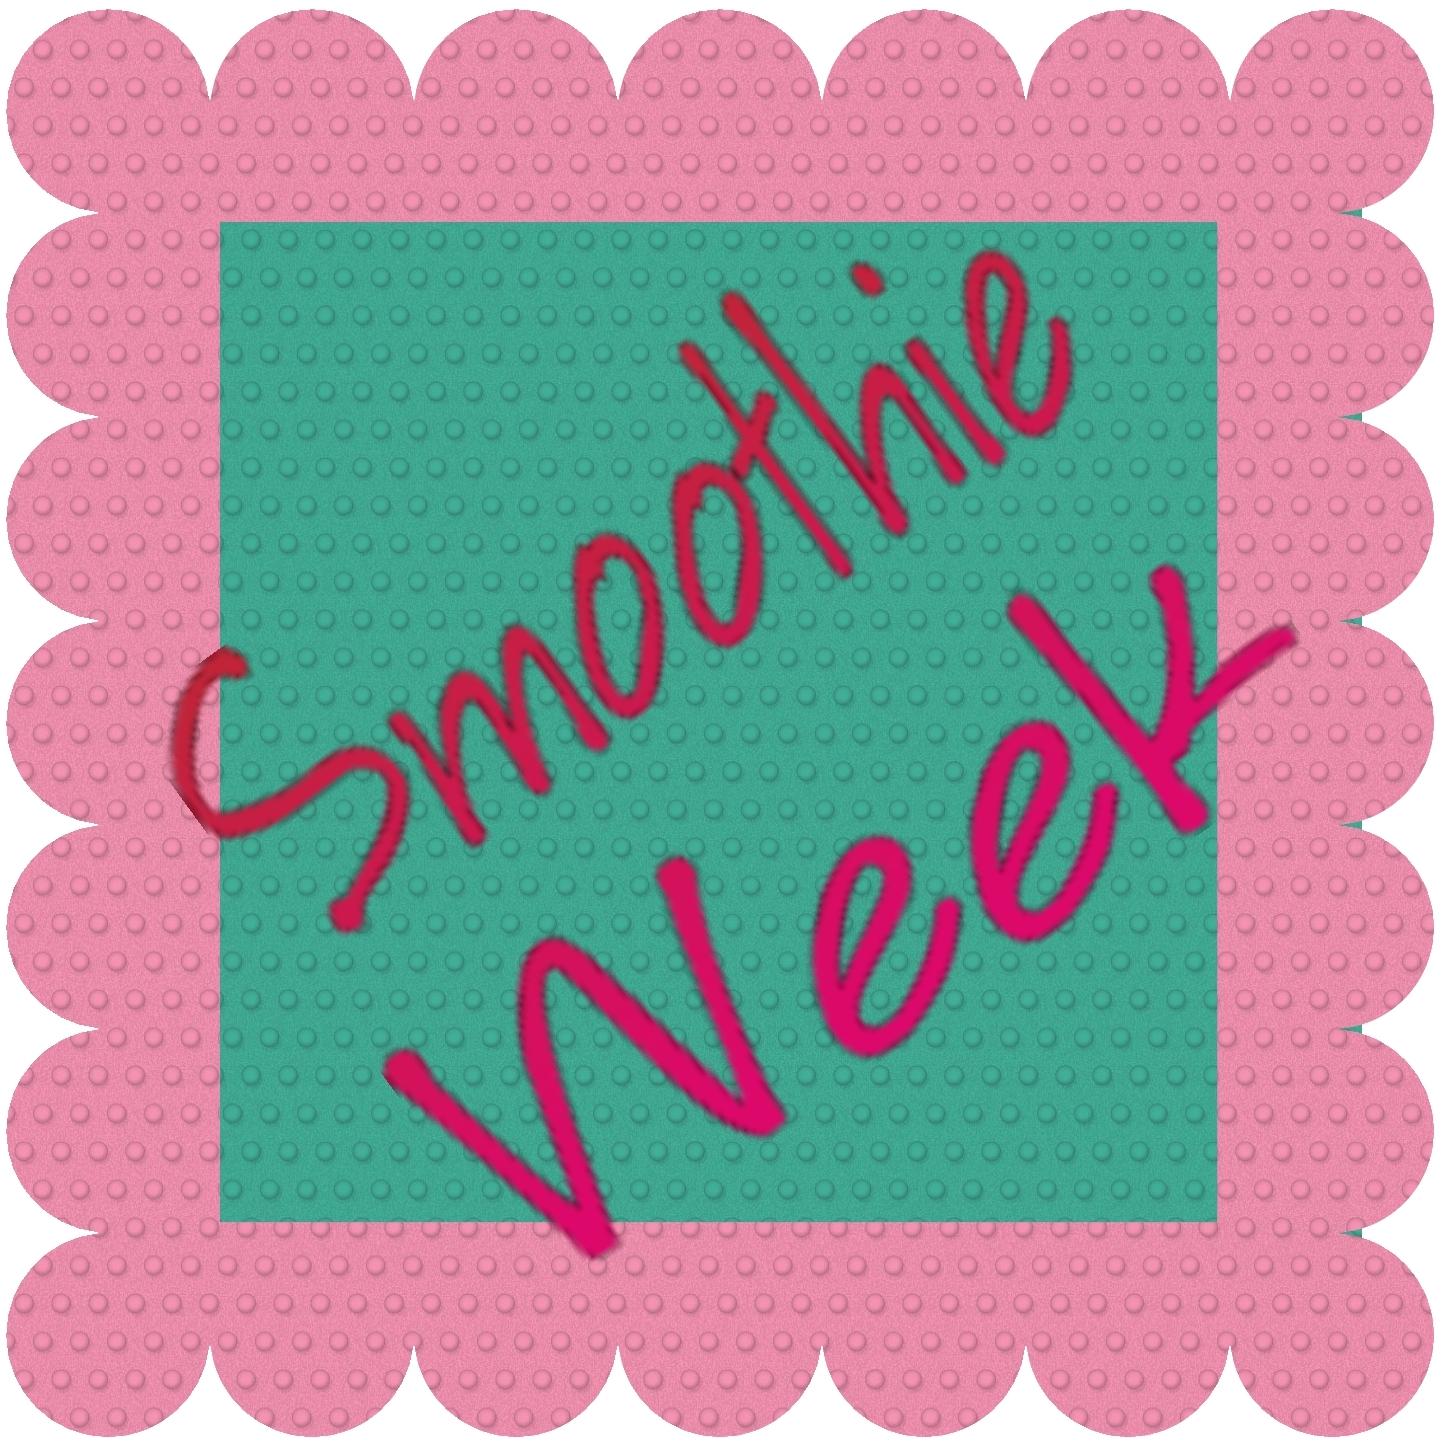 Melissa's Cuisine: Smoothie Week